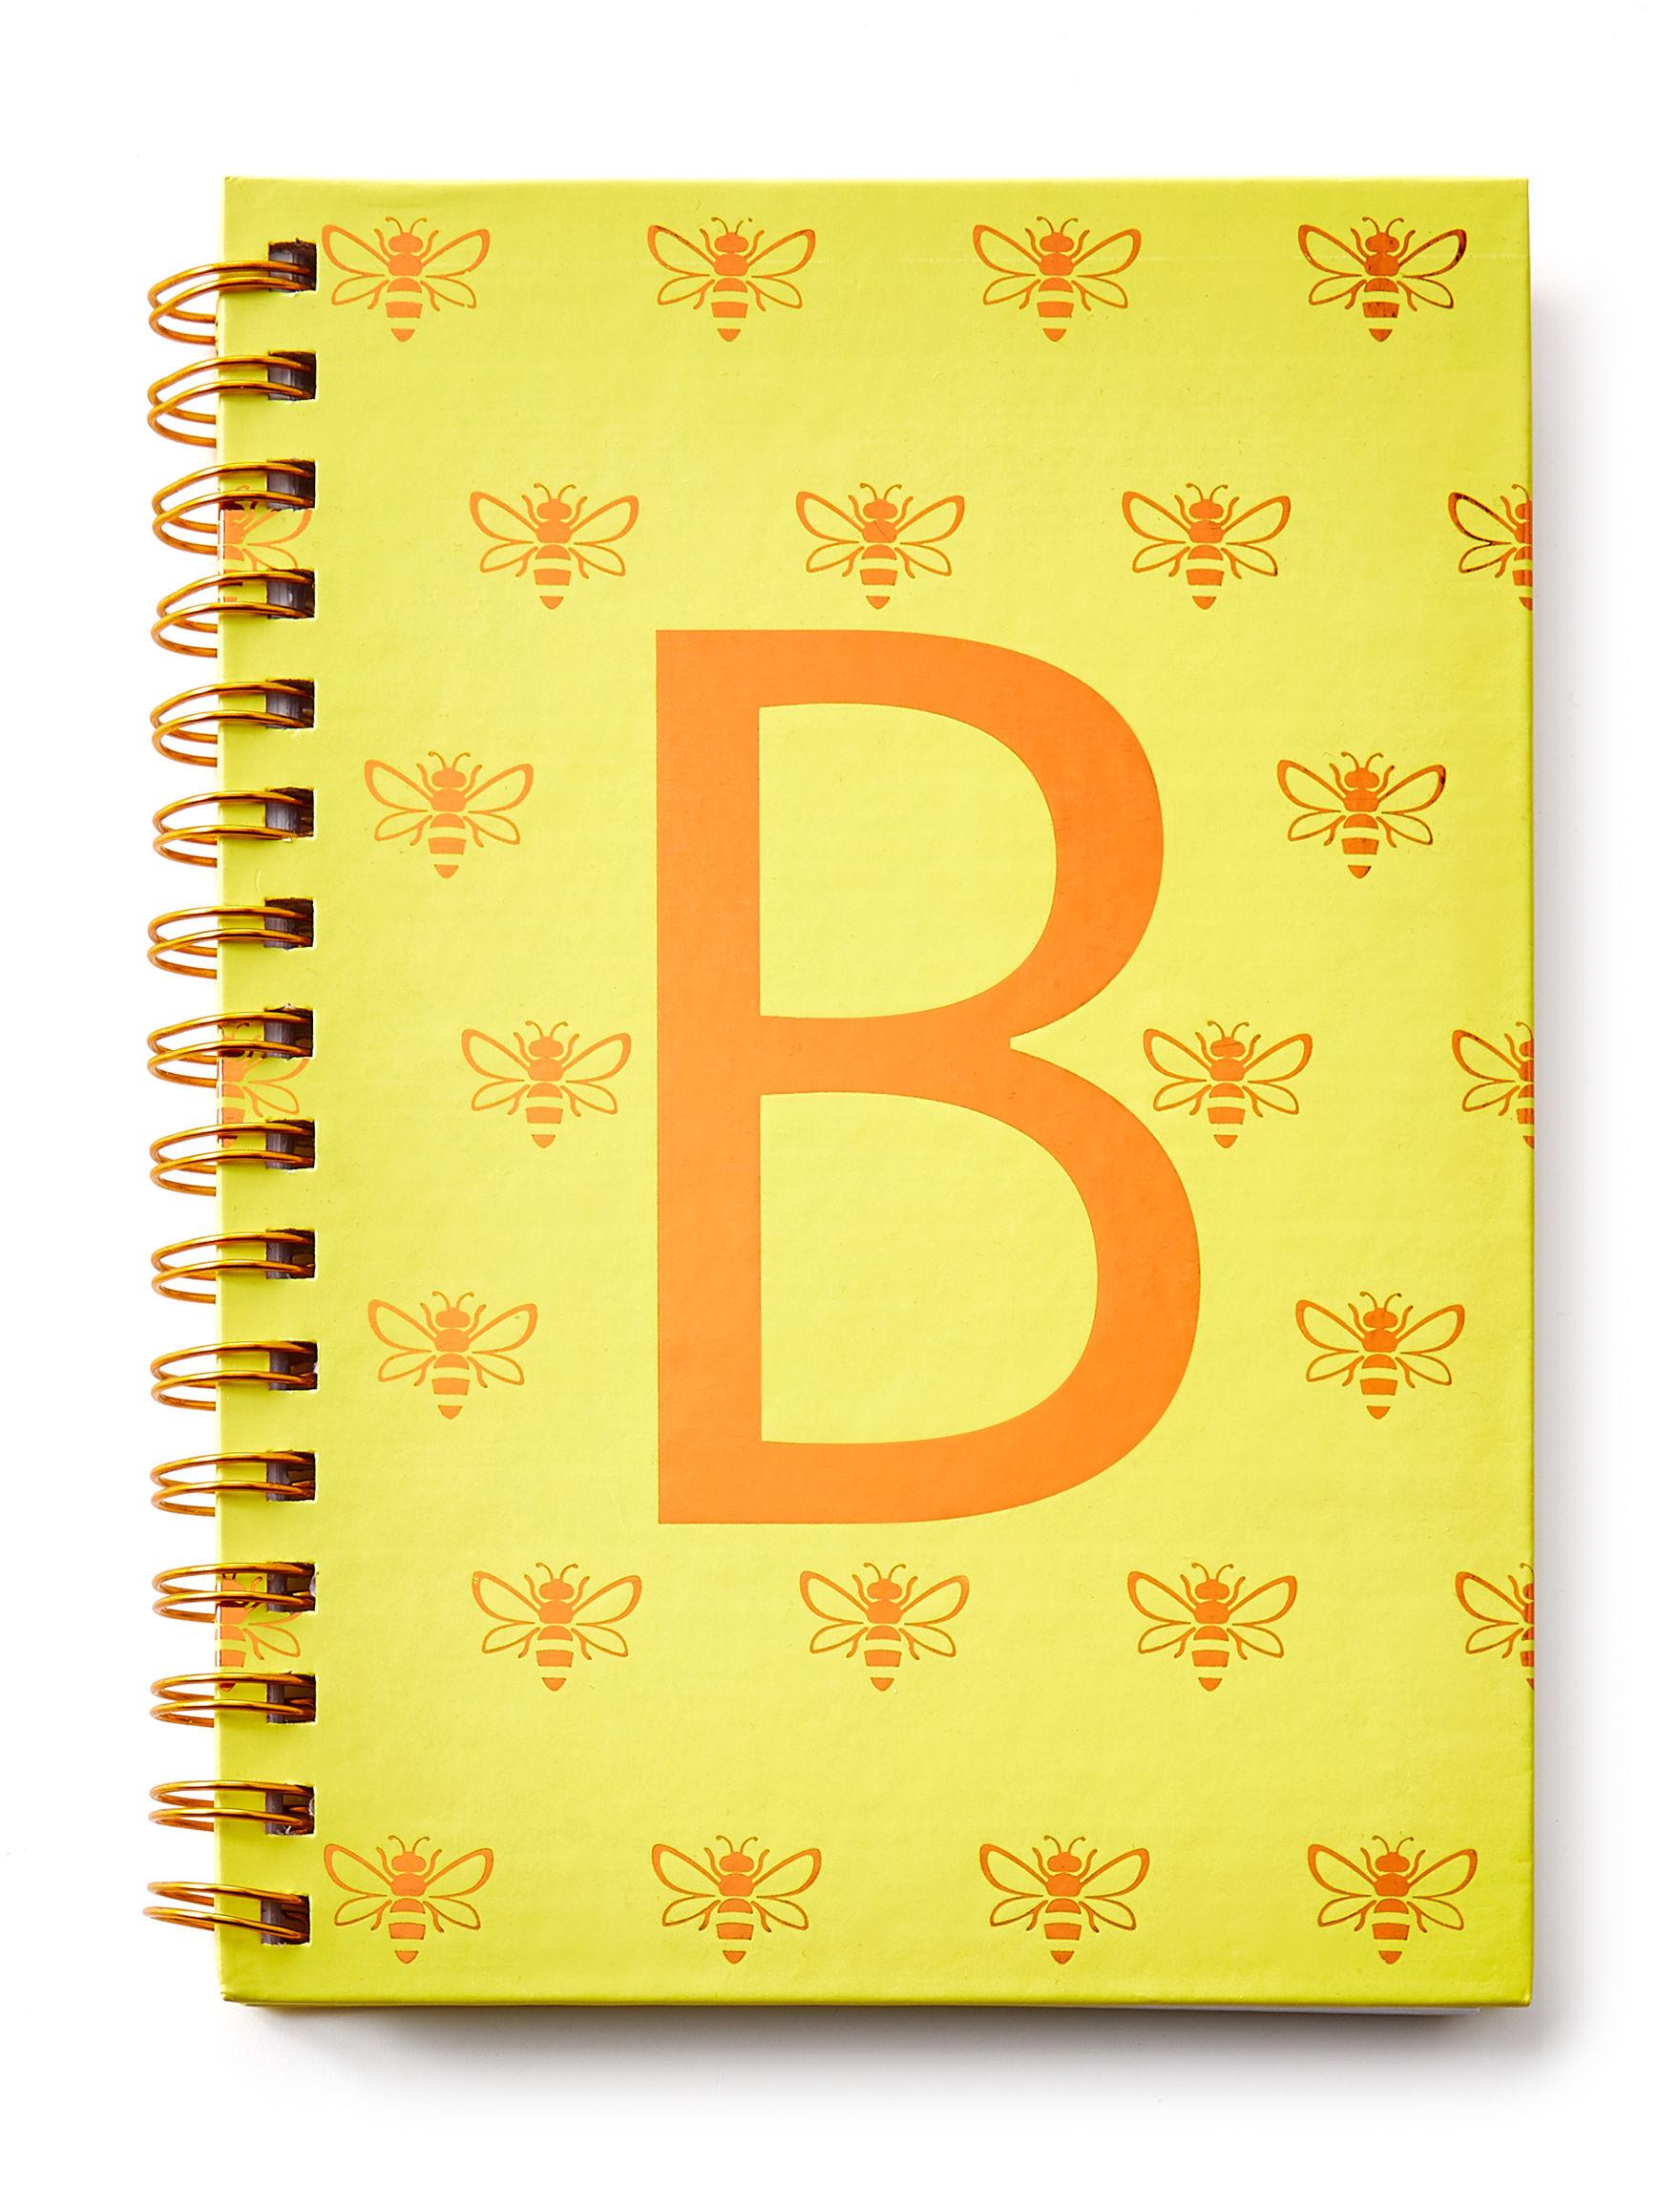 Tri Coastal Yellow Journals & Notepads Monogram School & Office Supplies